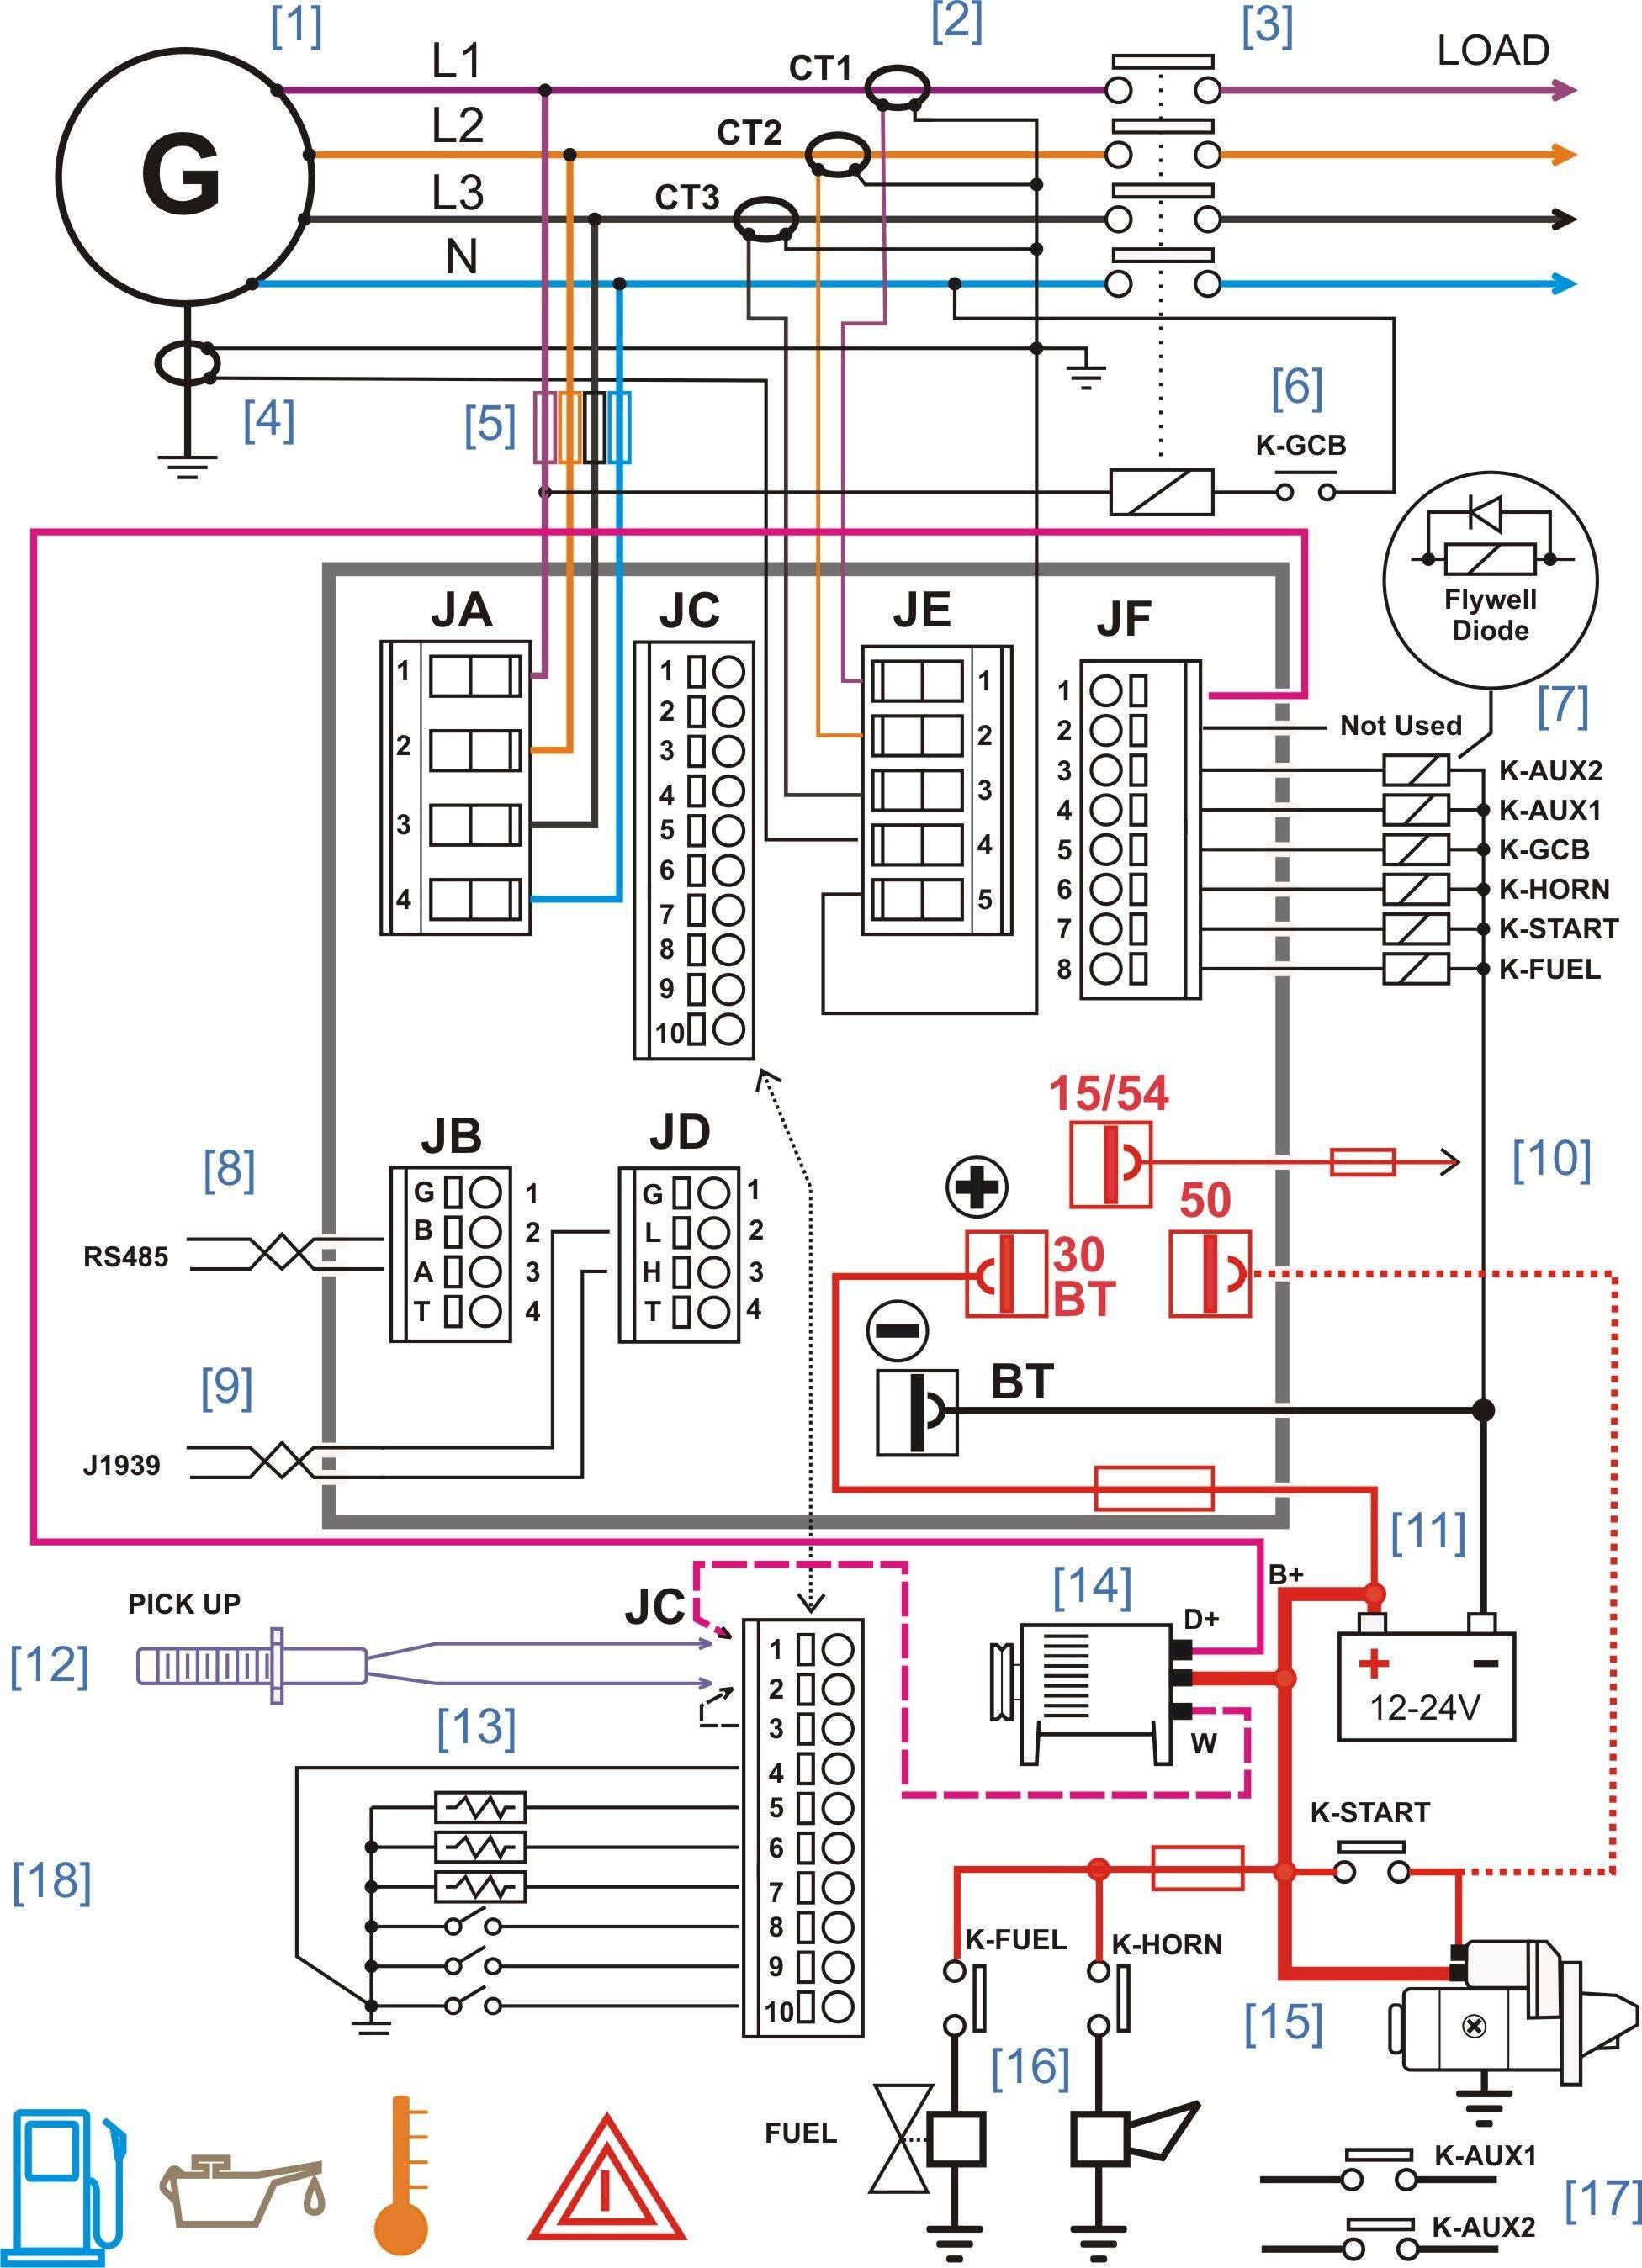 Home Electrical Wiring Diagram Elegant Diesel Generator Control Panel Wiring Diagram